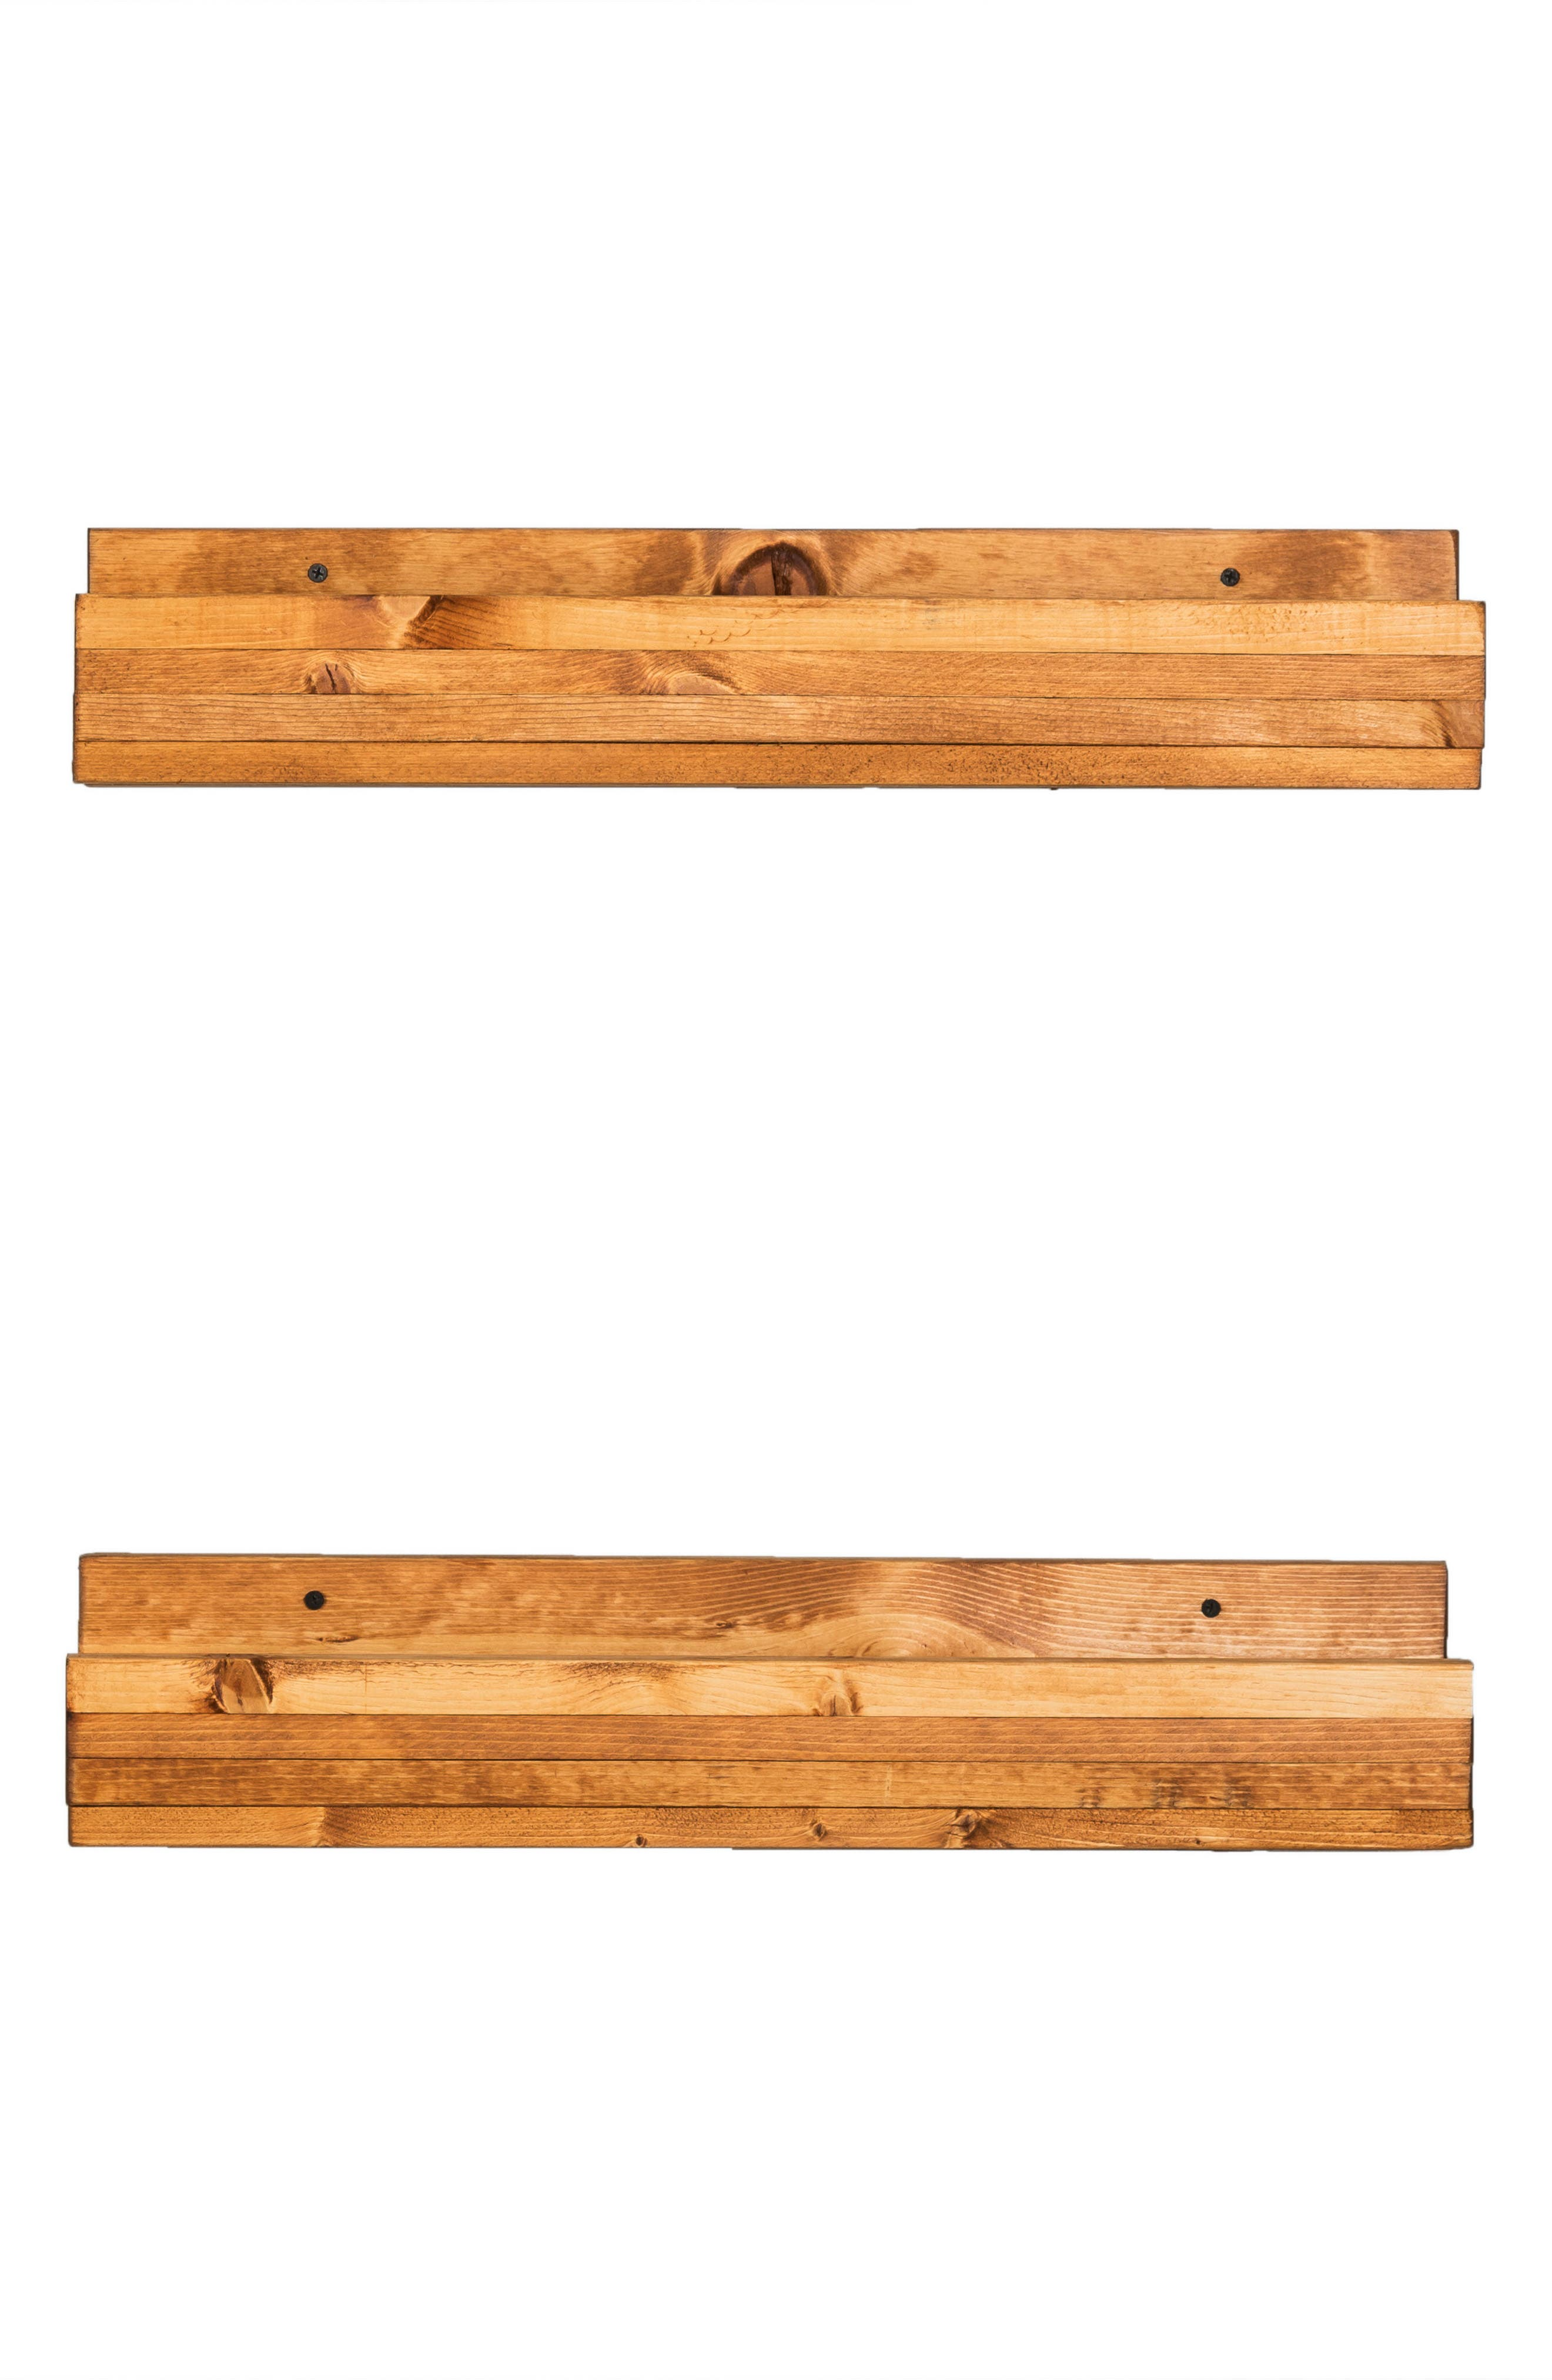 Alternate Image 1 Selected - (del)Hutson Designs Set of 2 Pine Wood Wine Racks